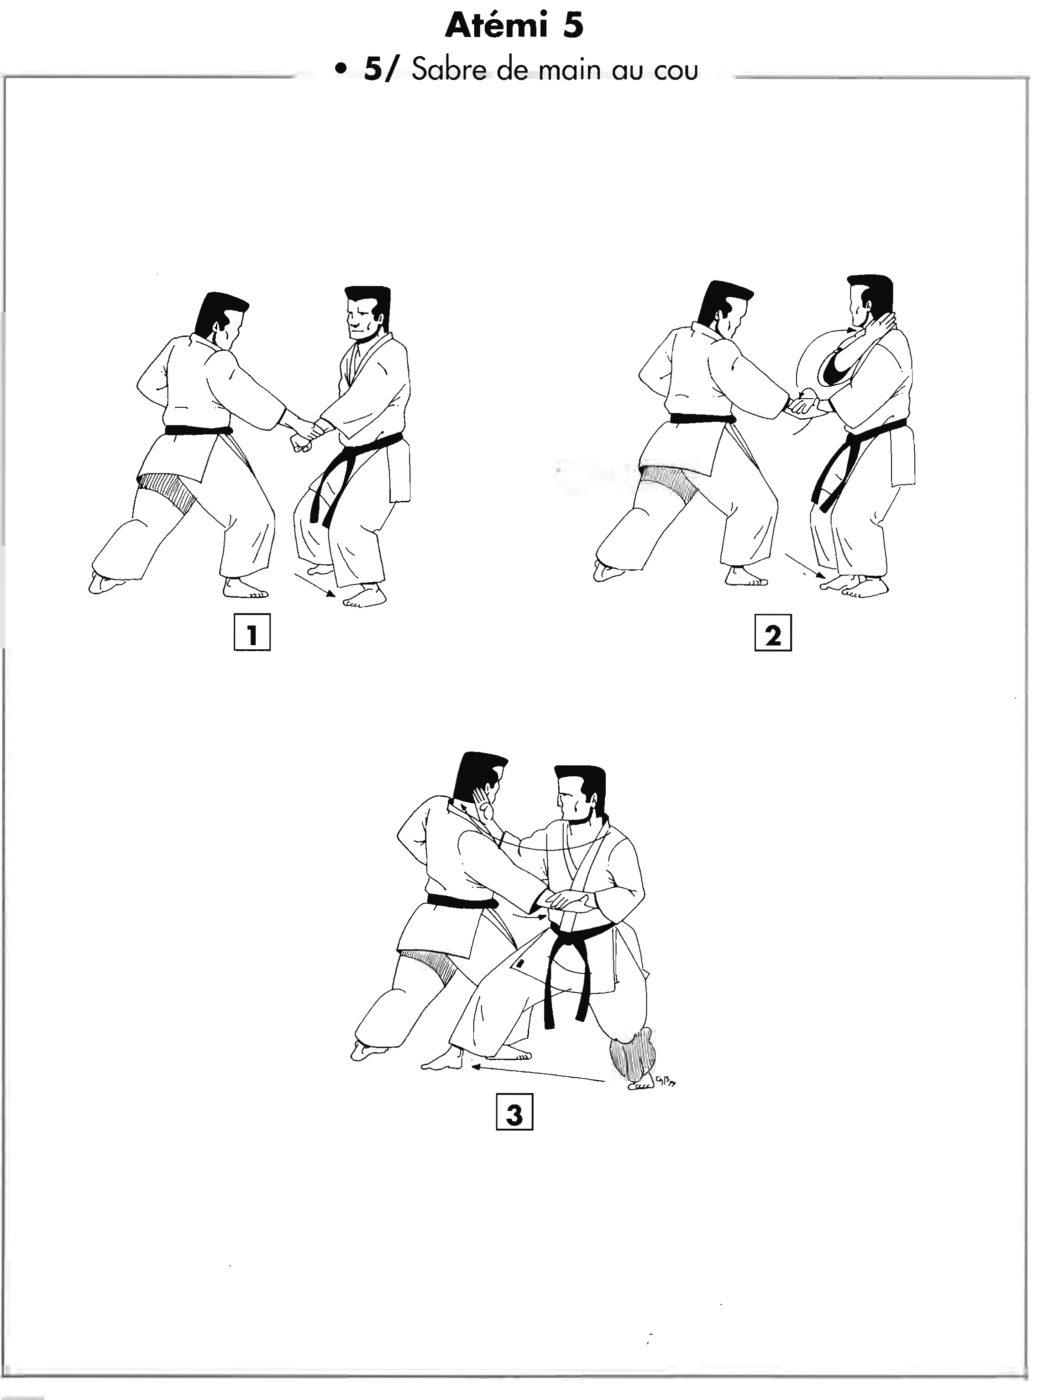 Atemi : jodan shuto uchi – sabre de main au cou